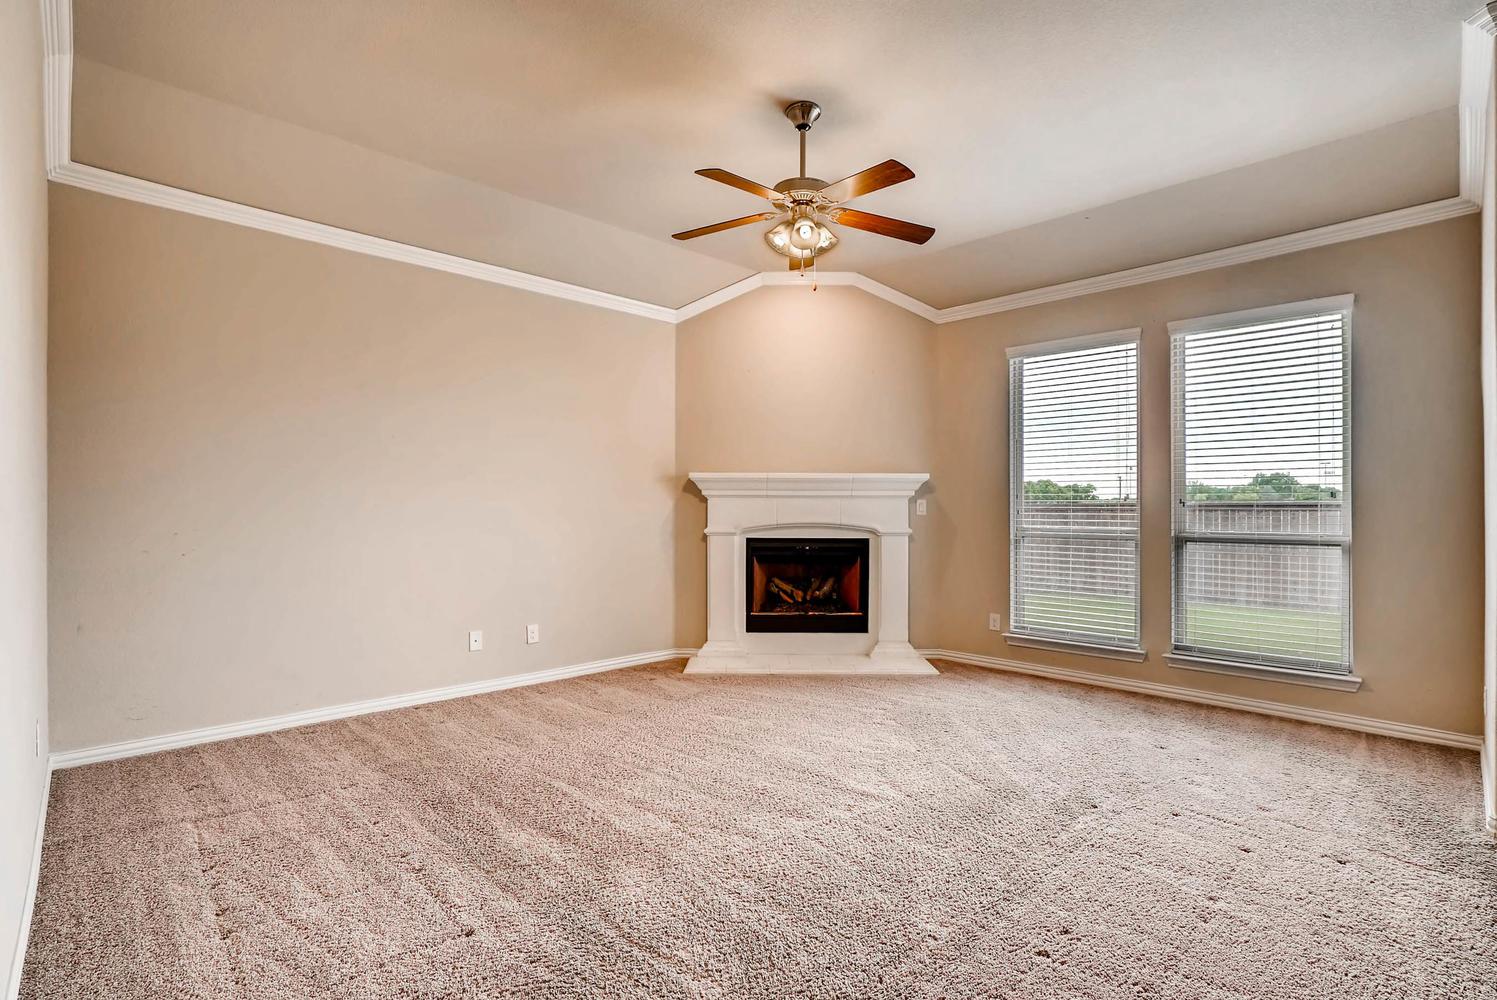 Photo of 7651 Watercrest Lane, Grand Prairie, TX 75054